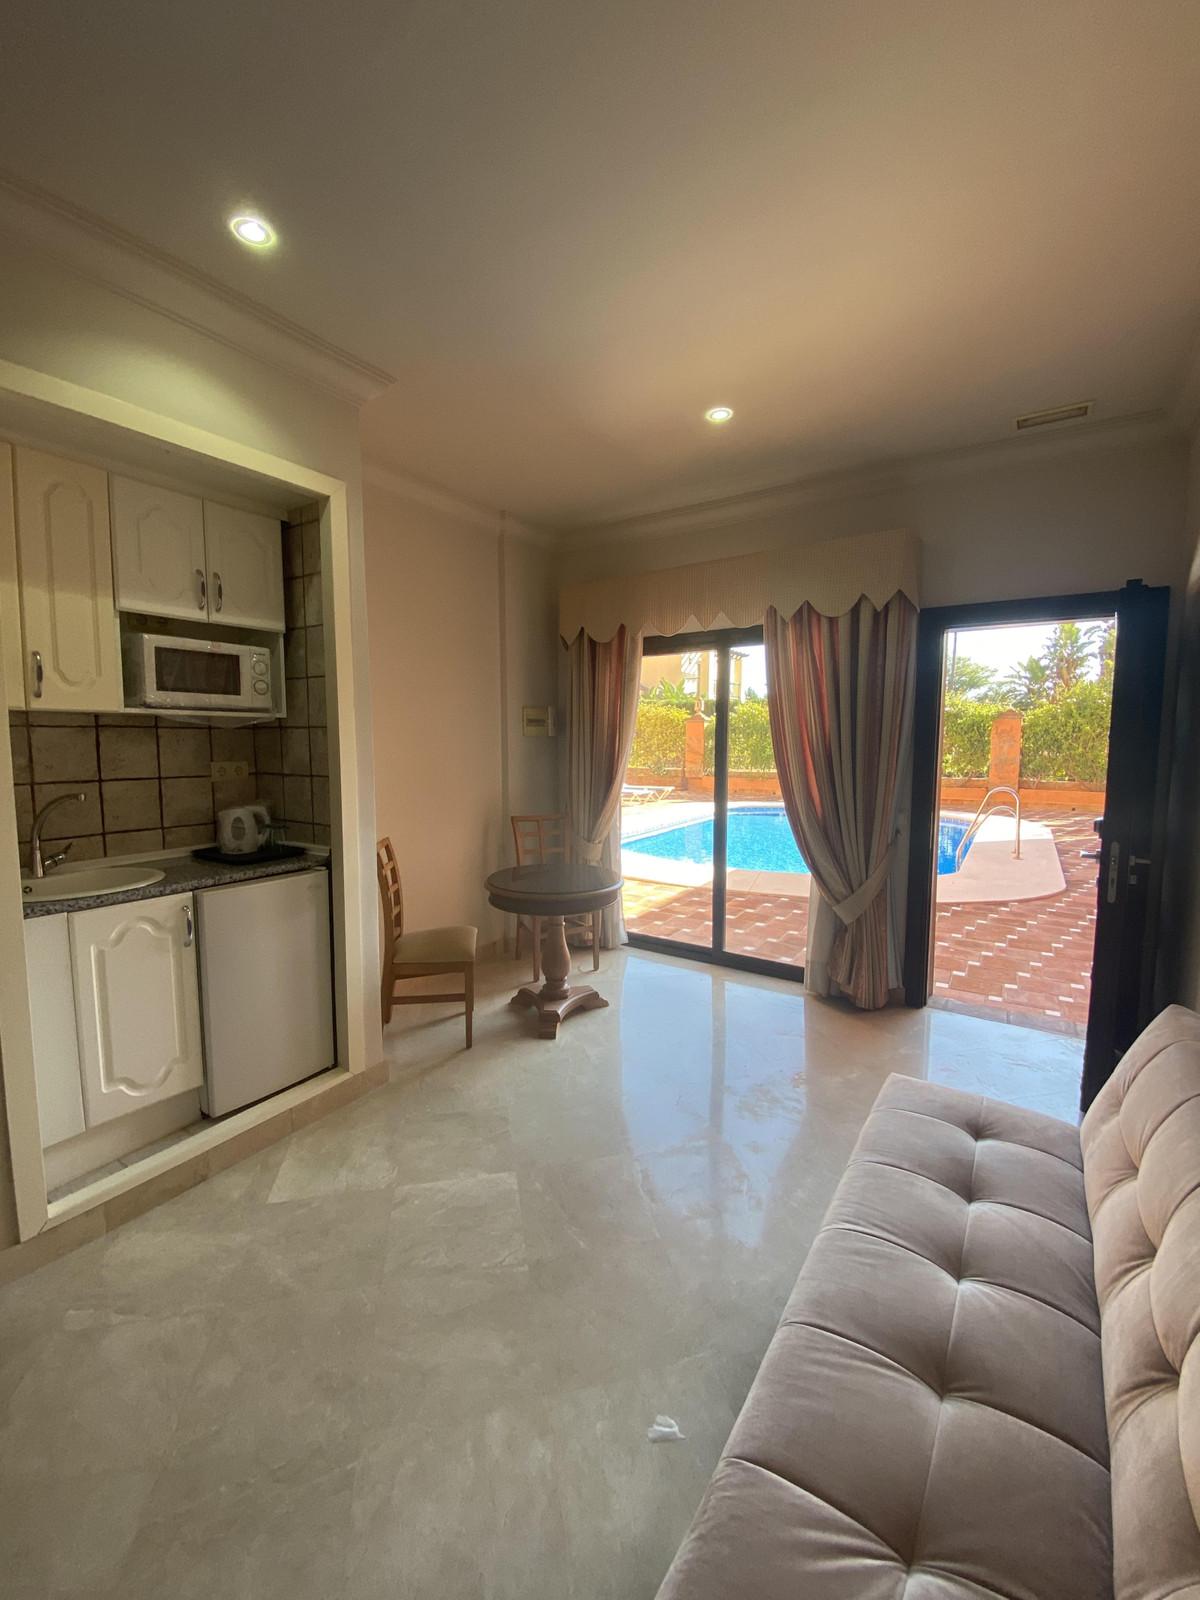 Апартамент - El Paraiso - R3806542 - mibgroup.es